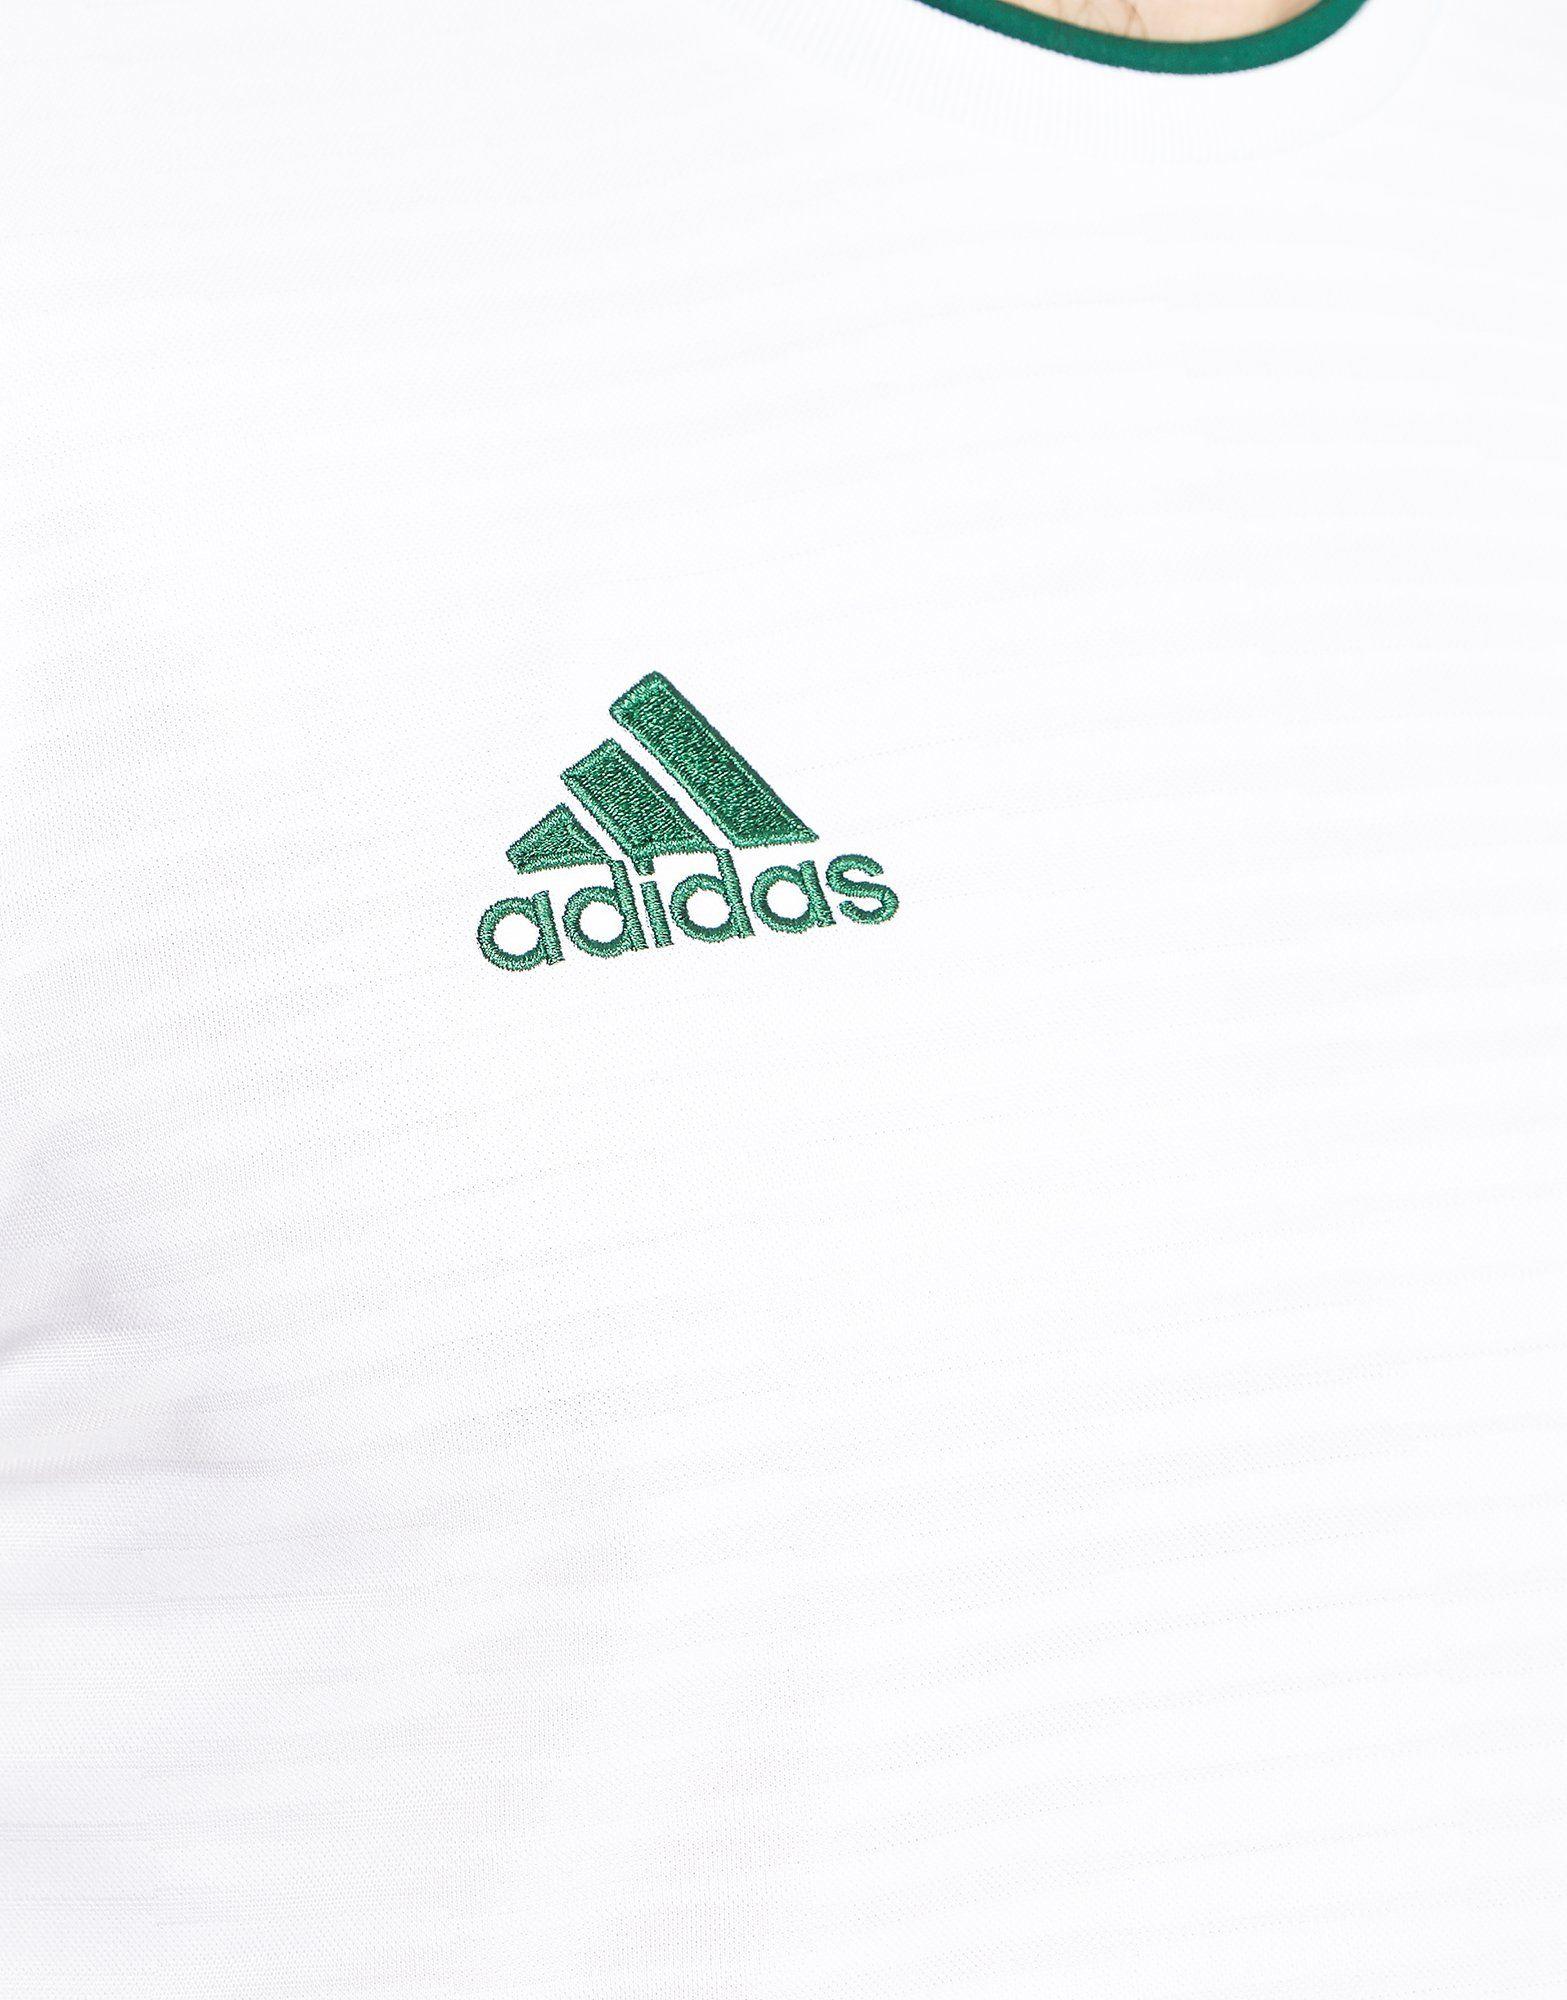 adidas Galles 2018/19 Maglia Away